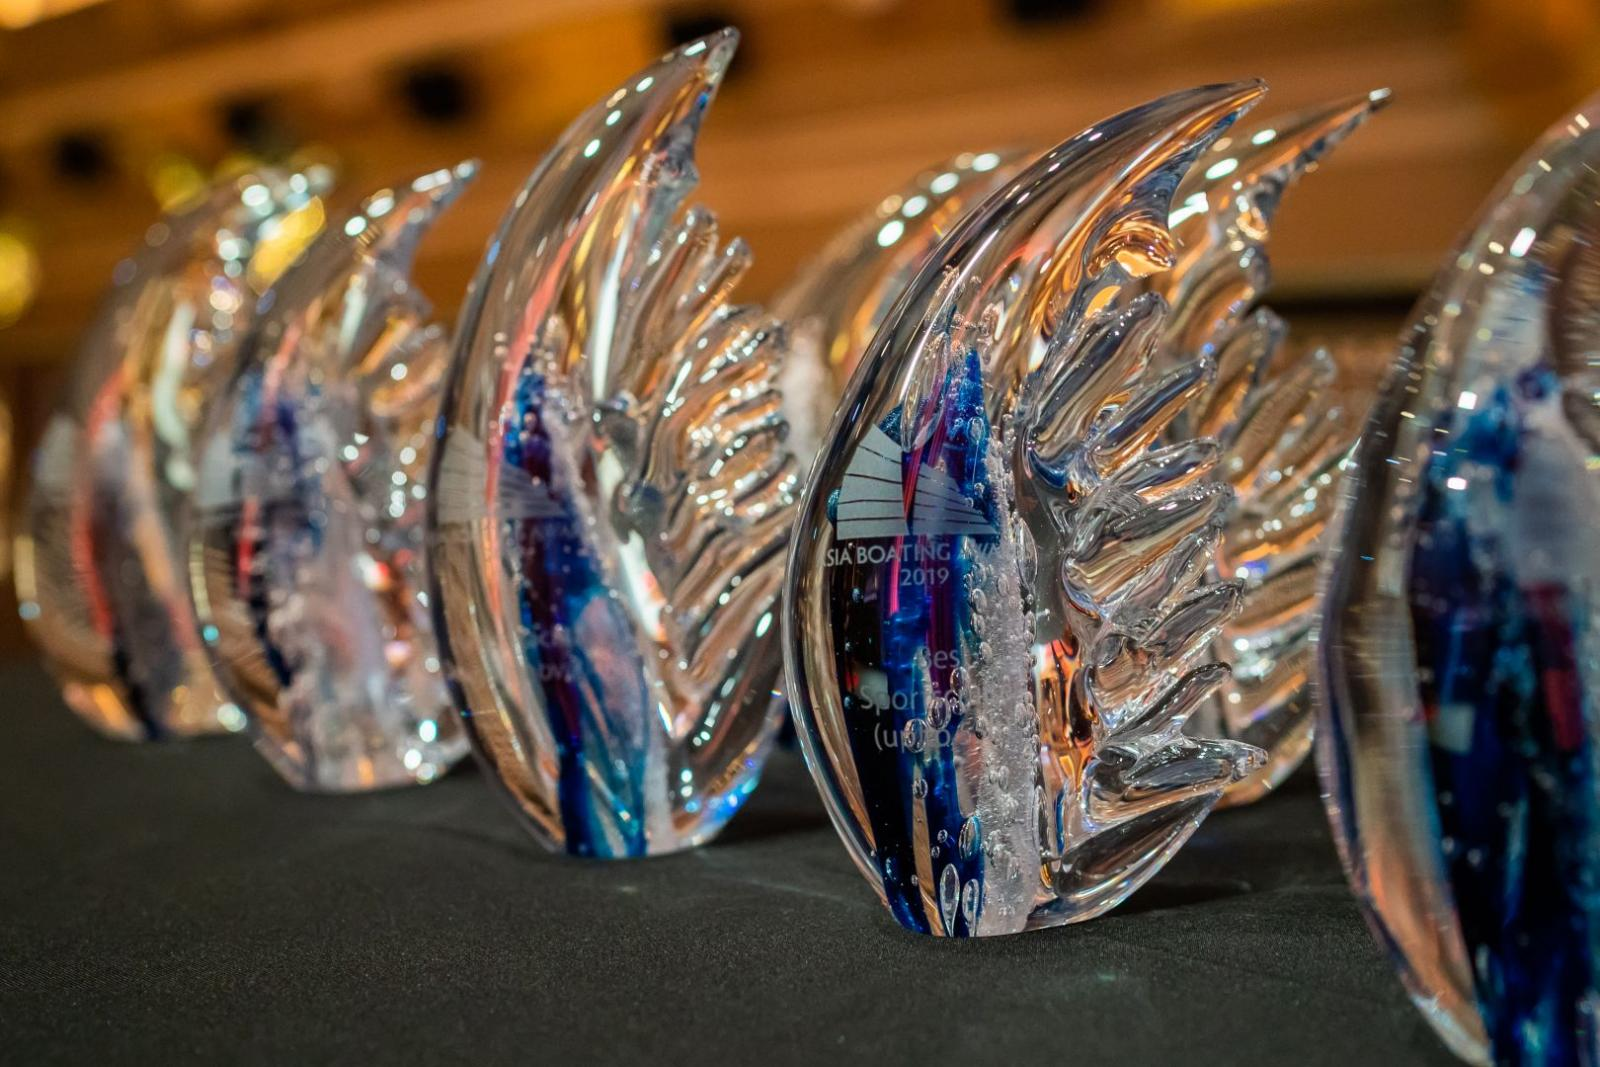 Benetti Megayacht Spectre Award